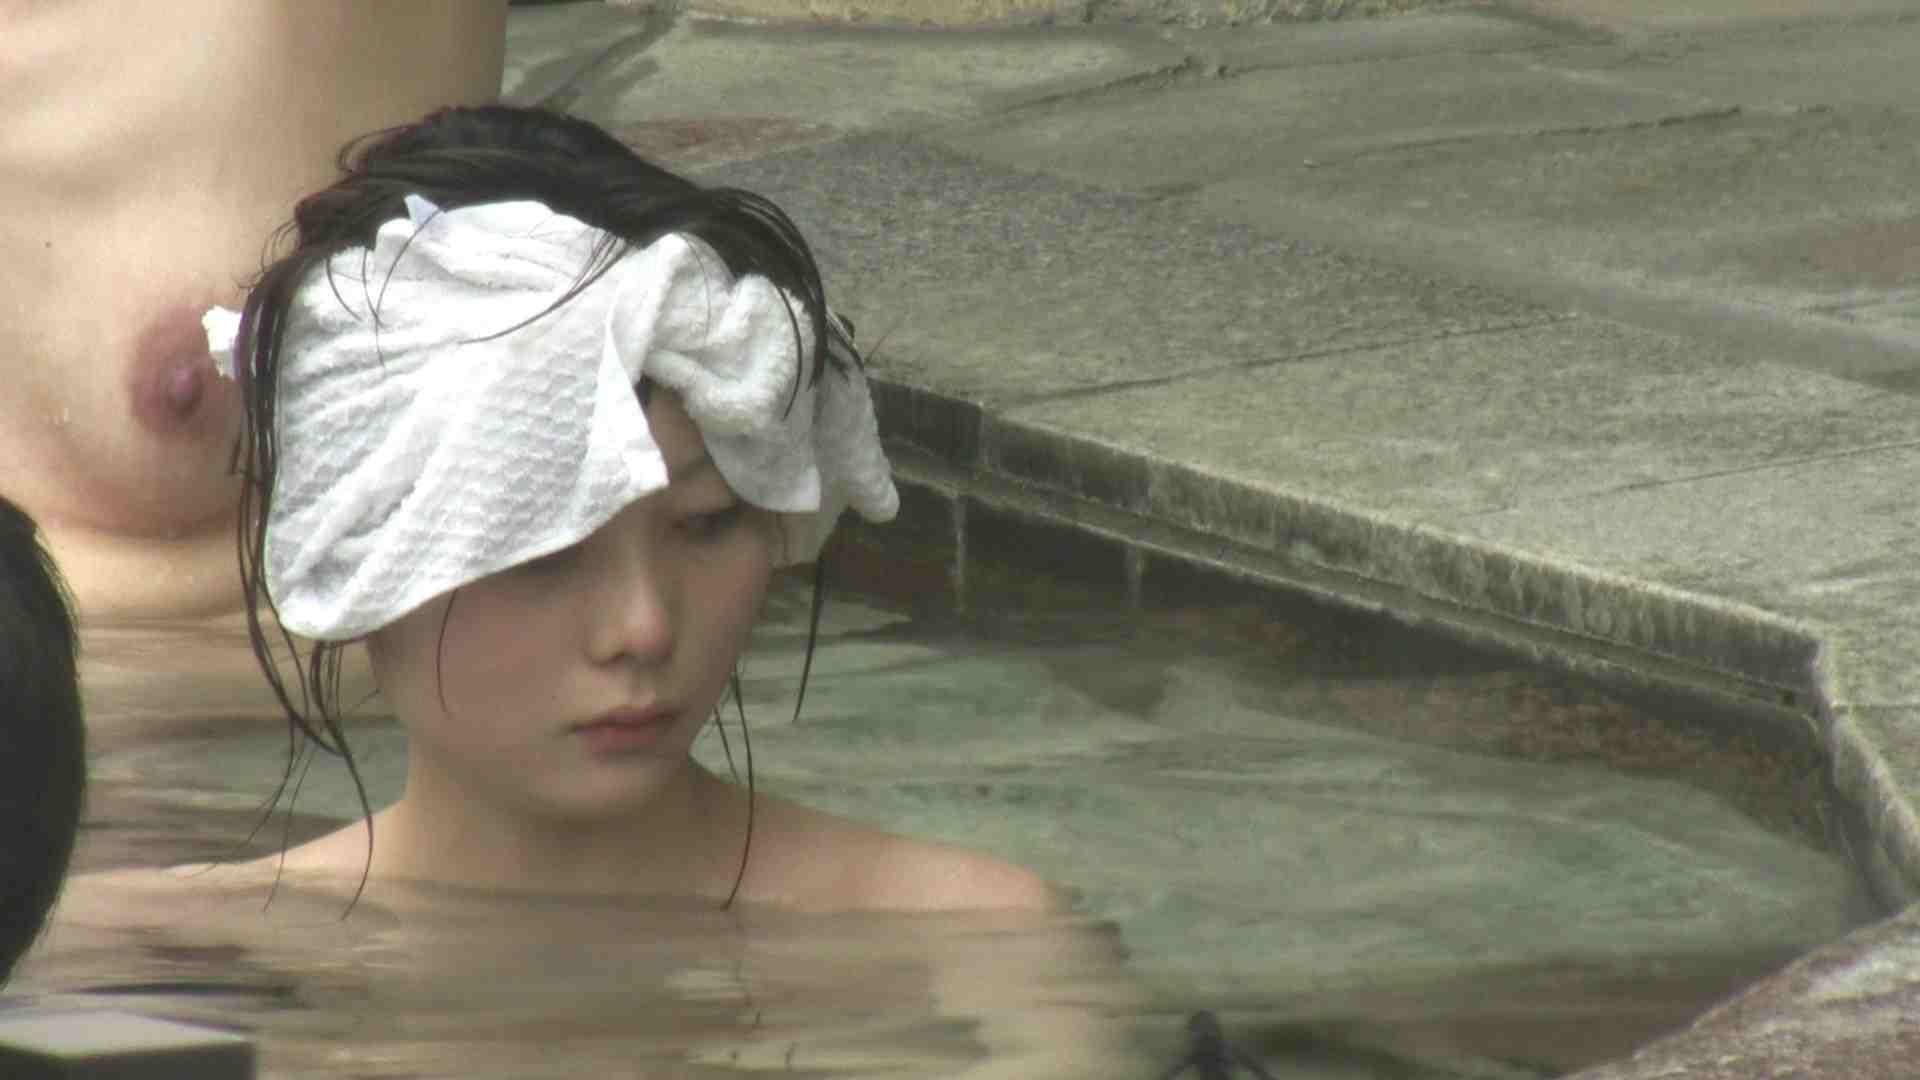 Aquaな露天風呂Vol.147 盗撮 | OLセックス  85画像 13